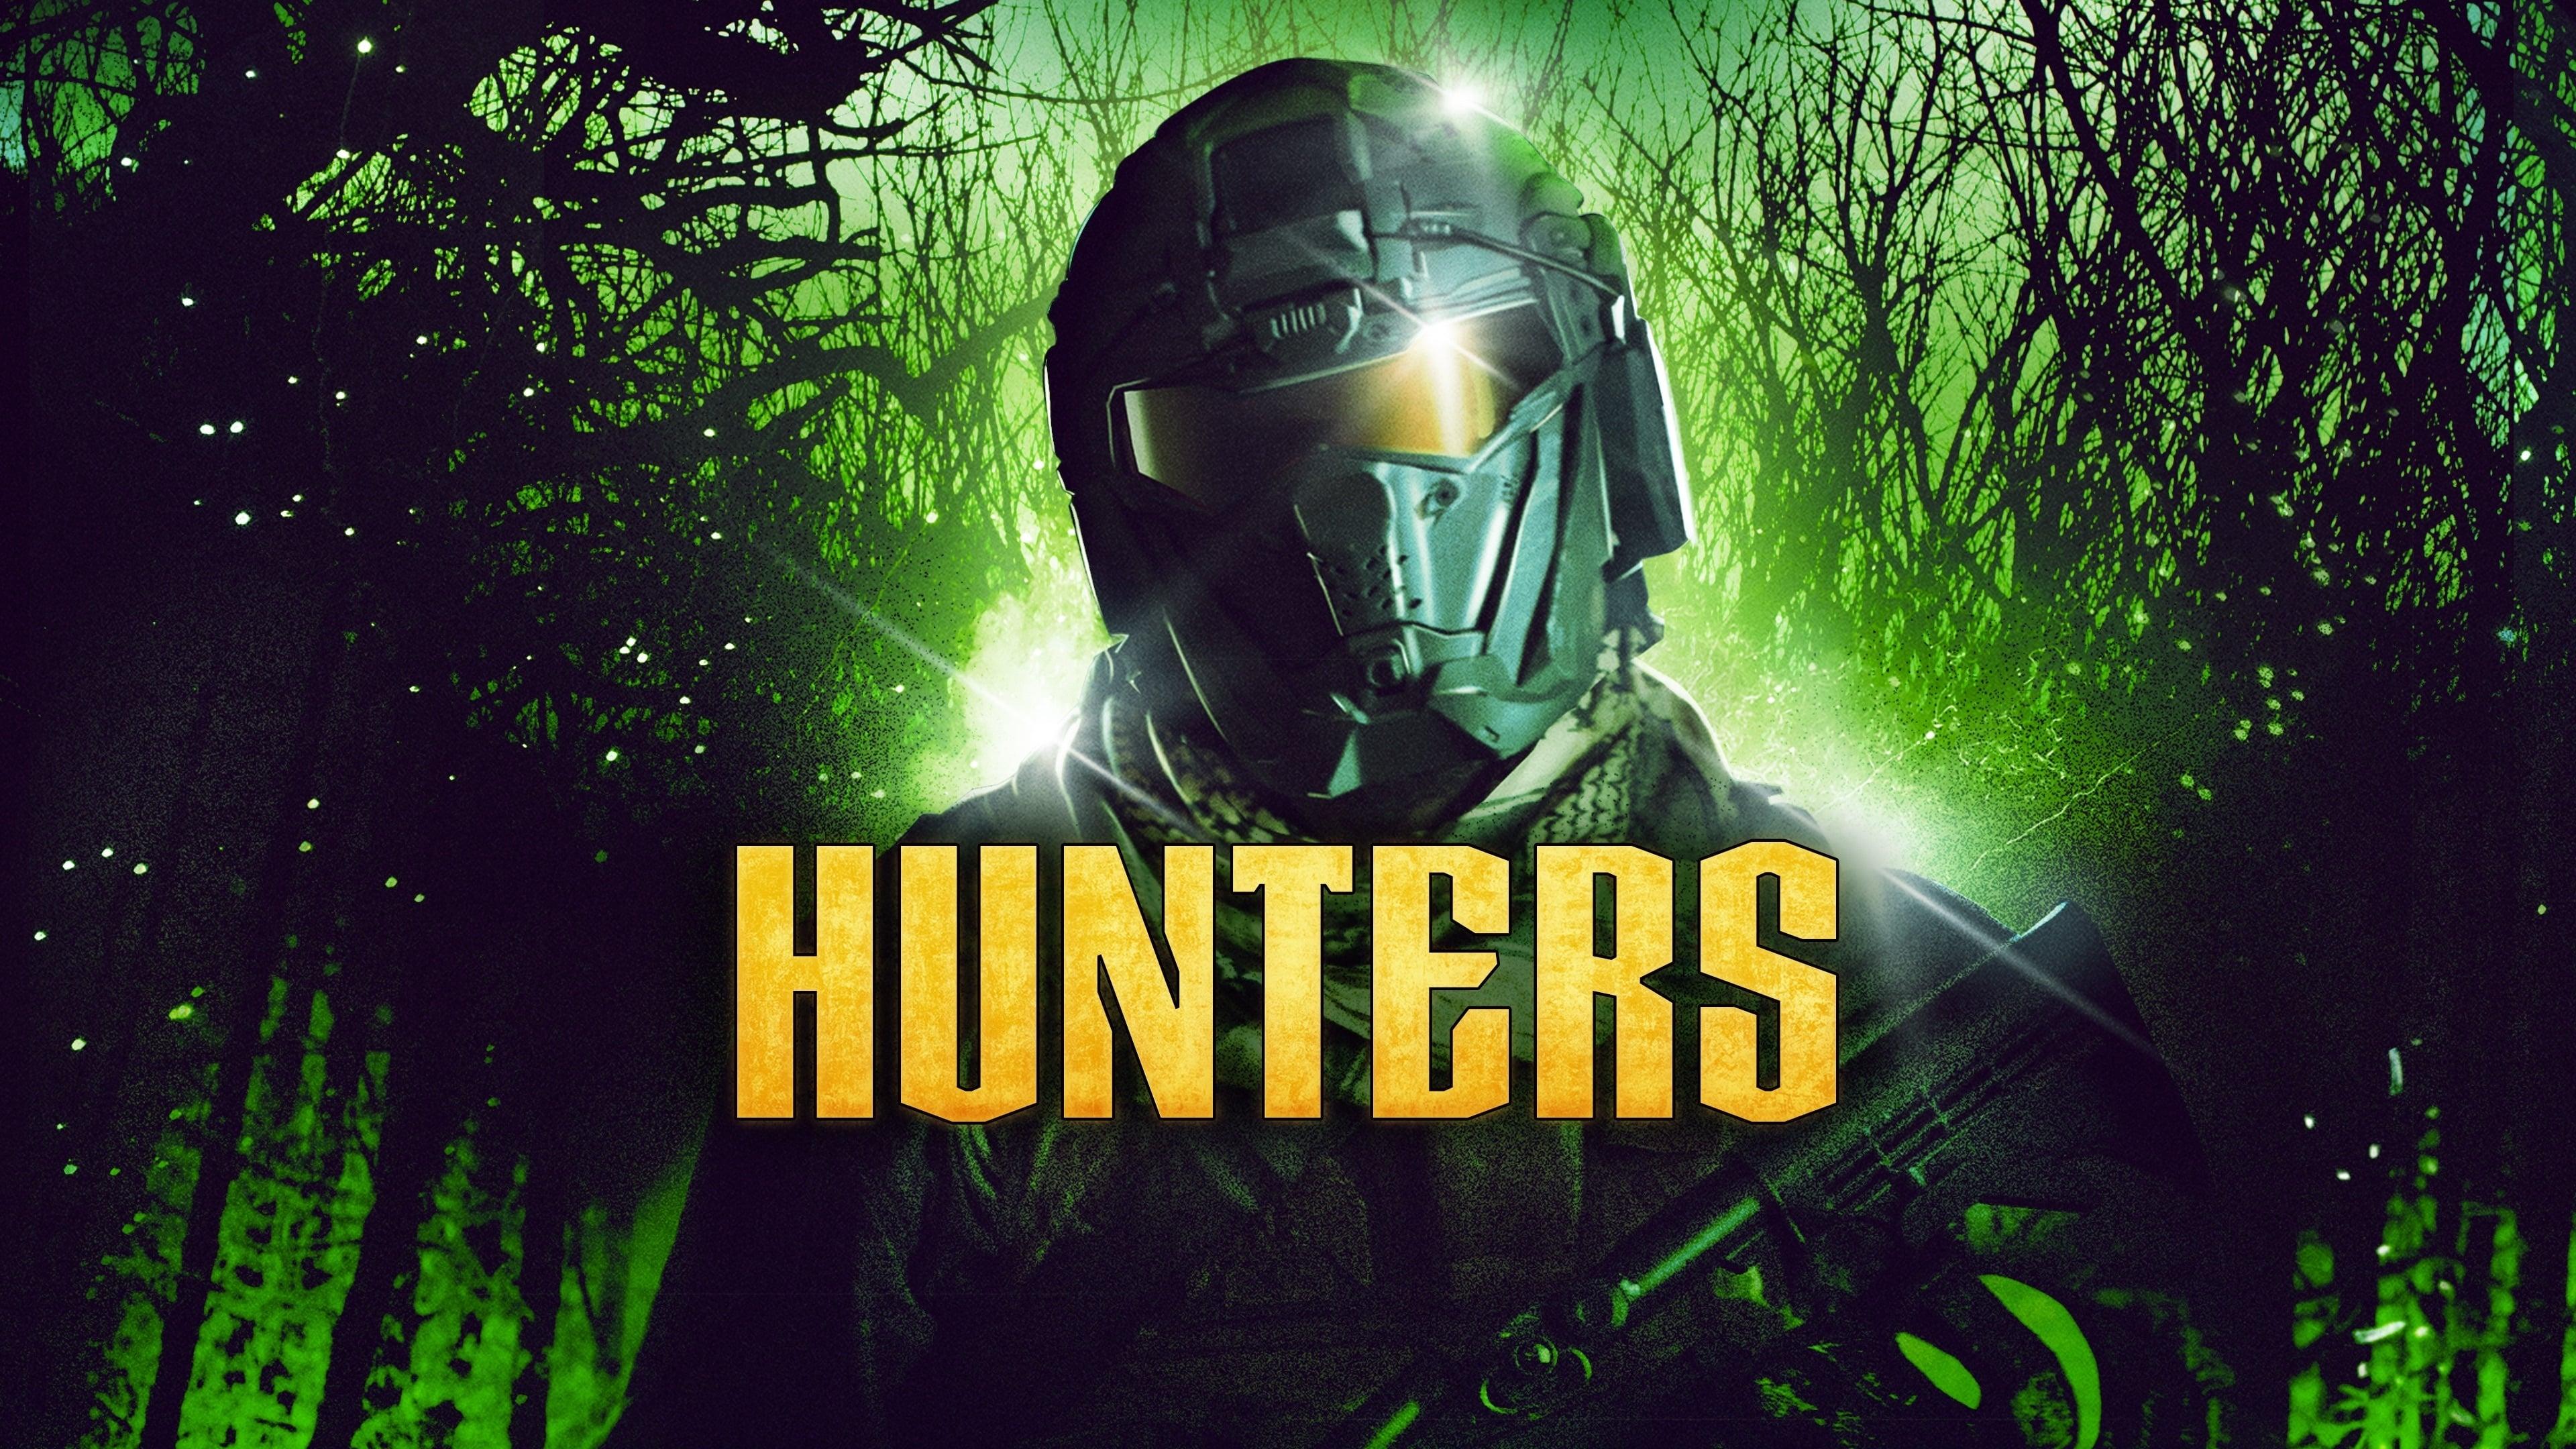 Hunters (2021) Movie English Full Movie Watch Online